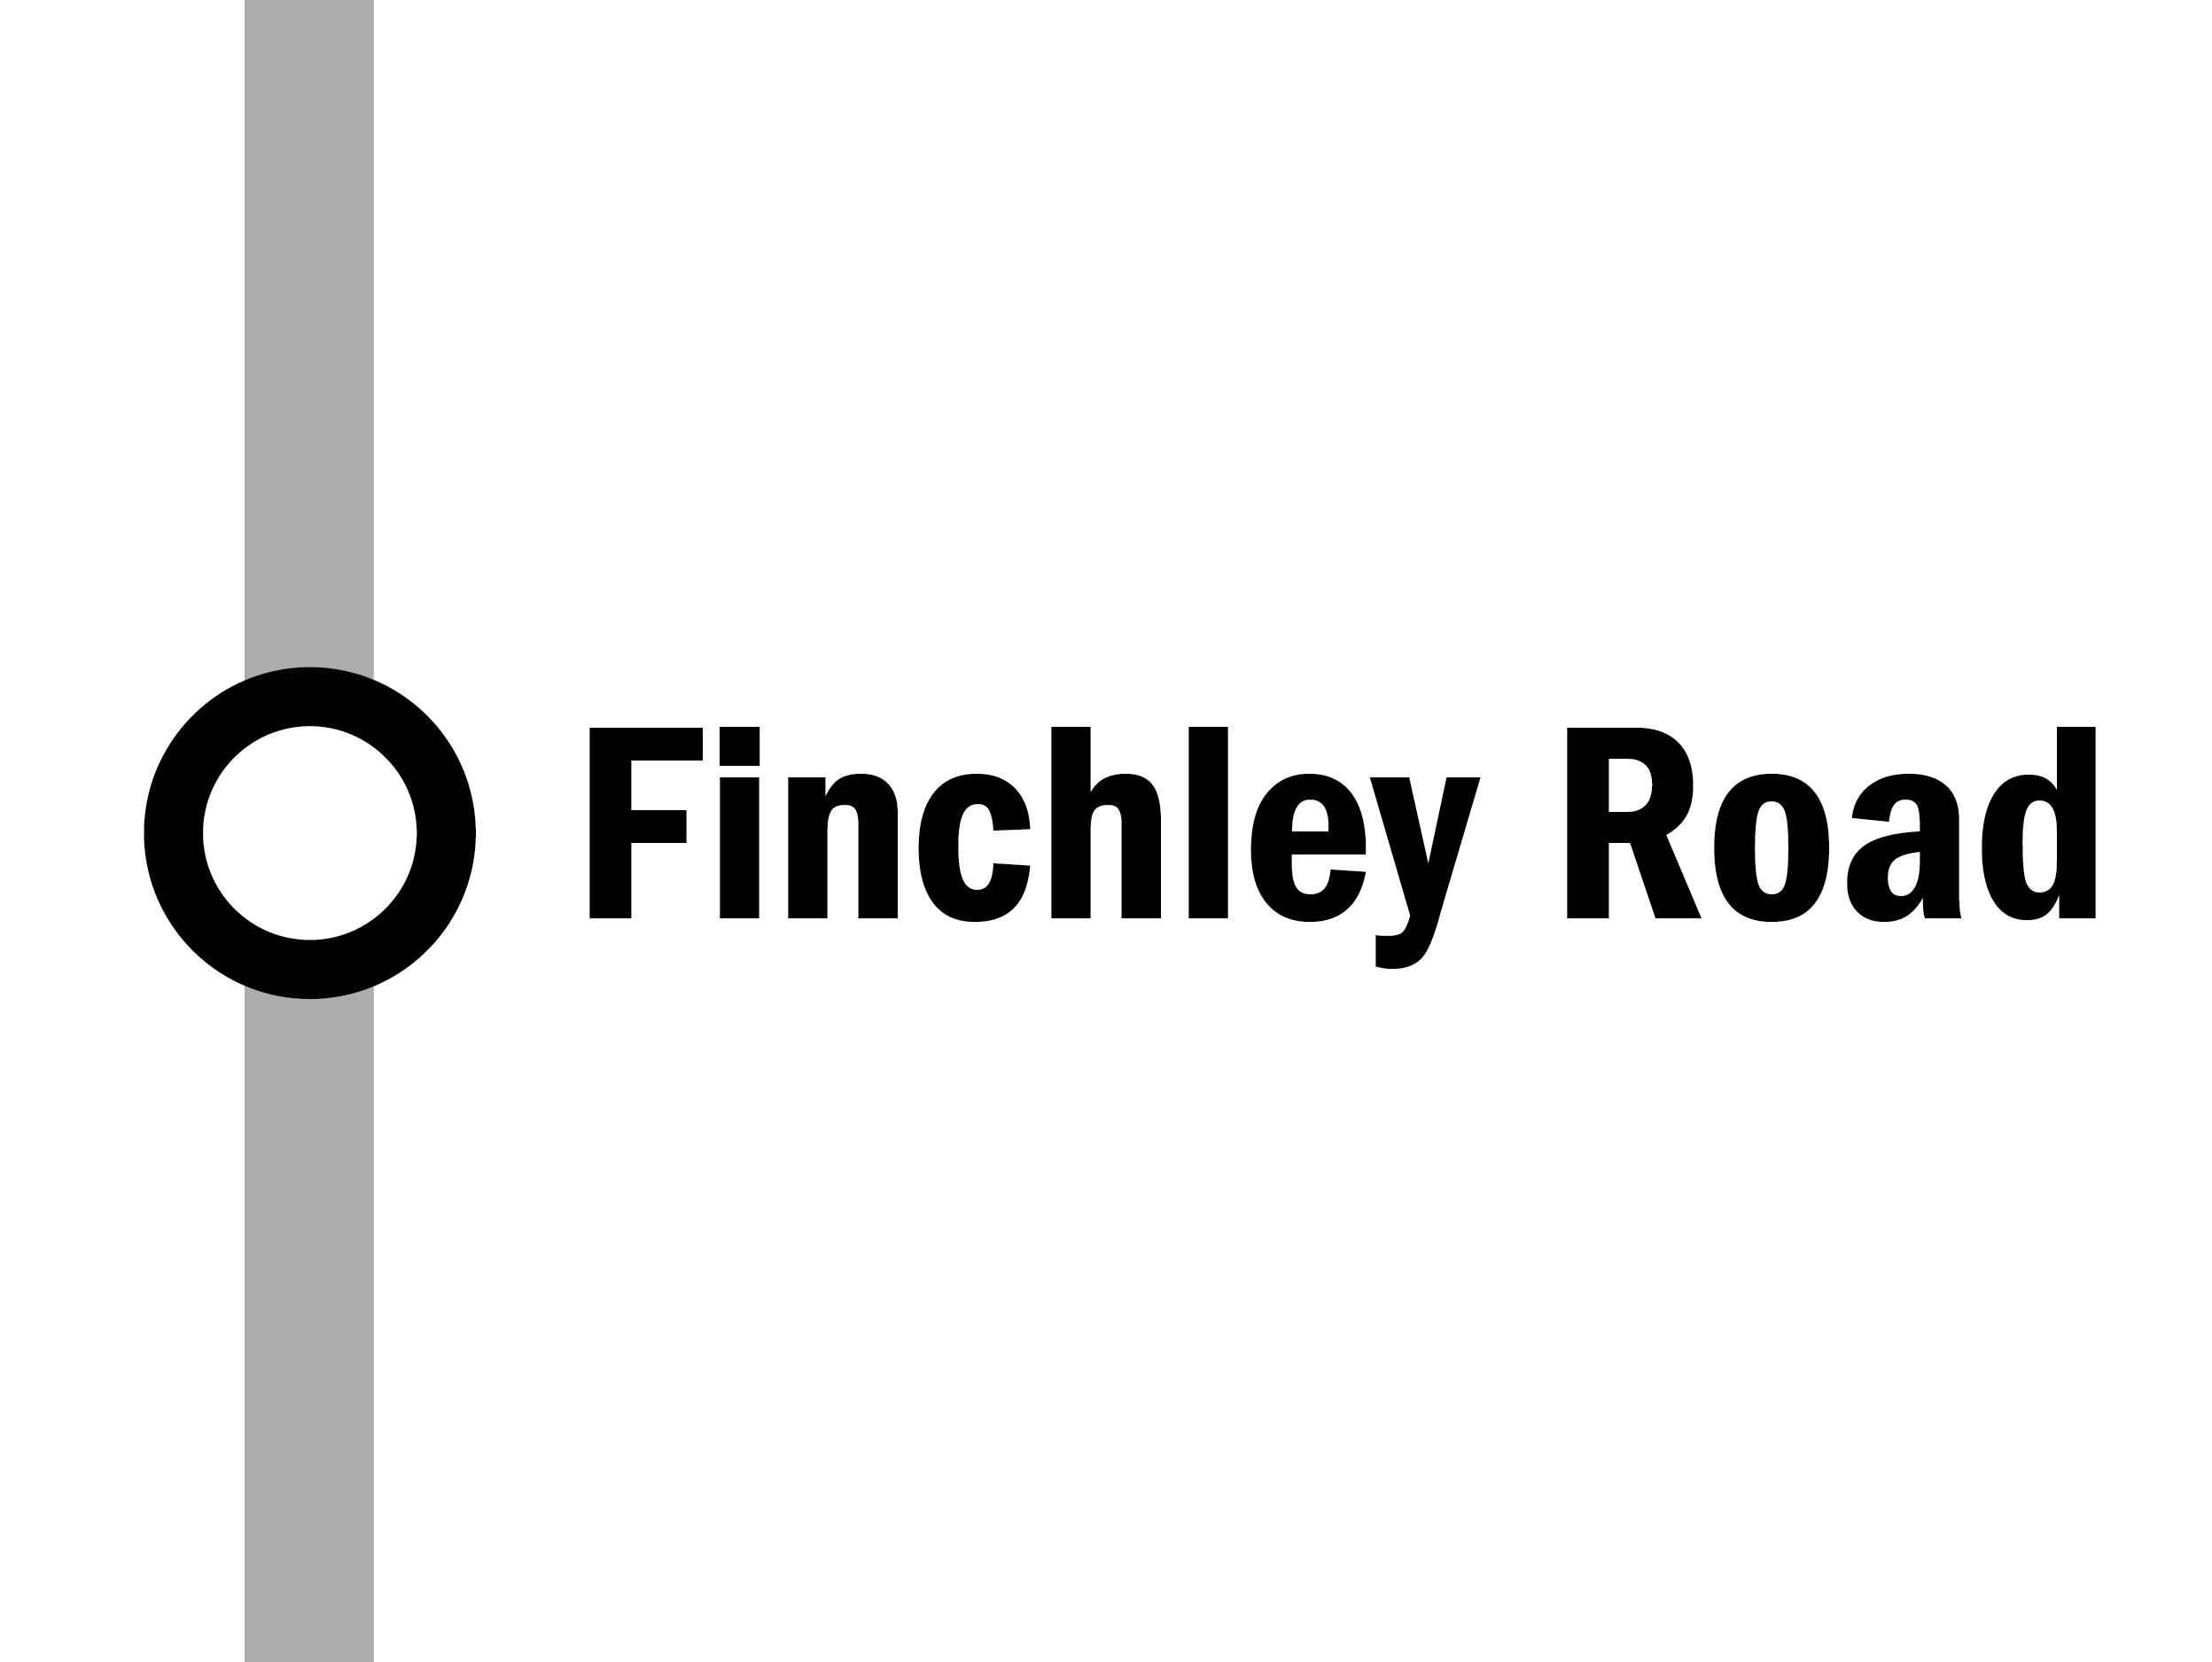 Finchley Road, night tube